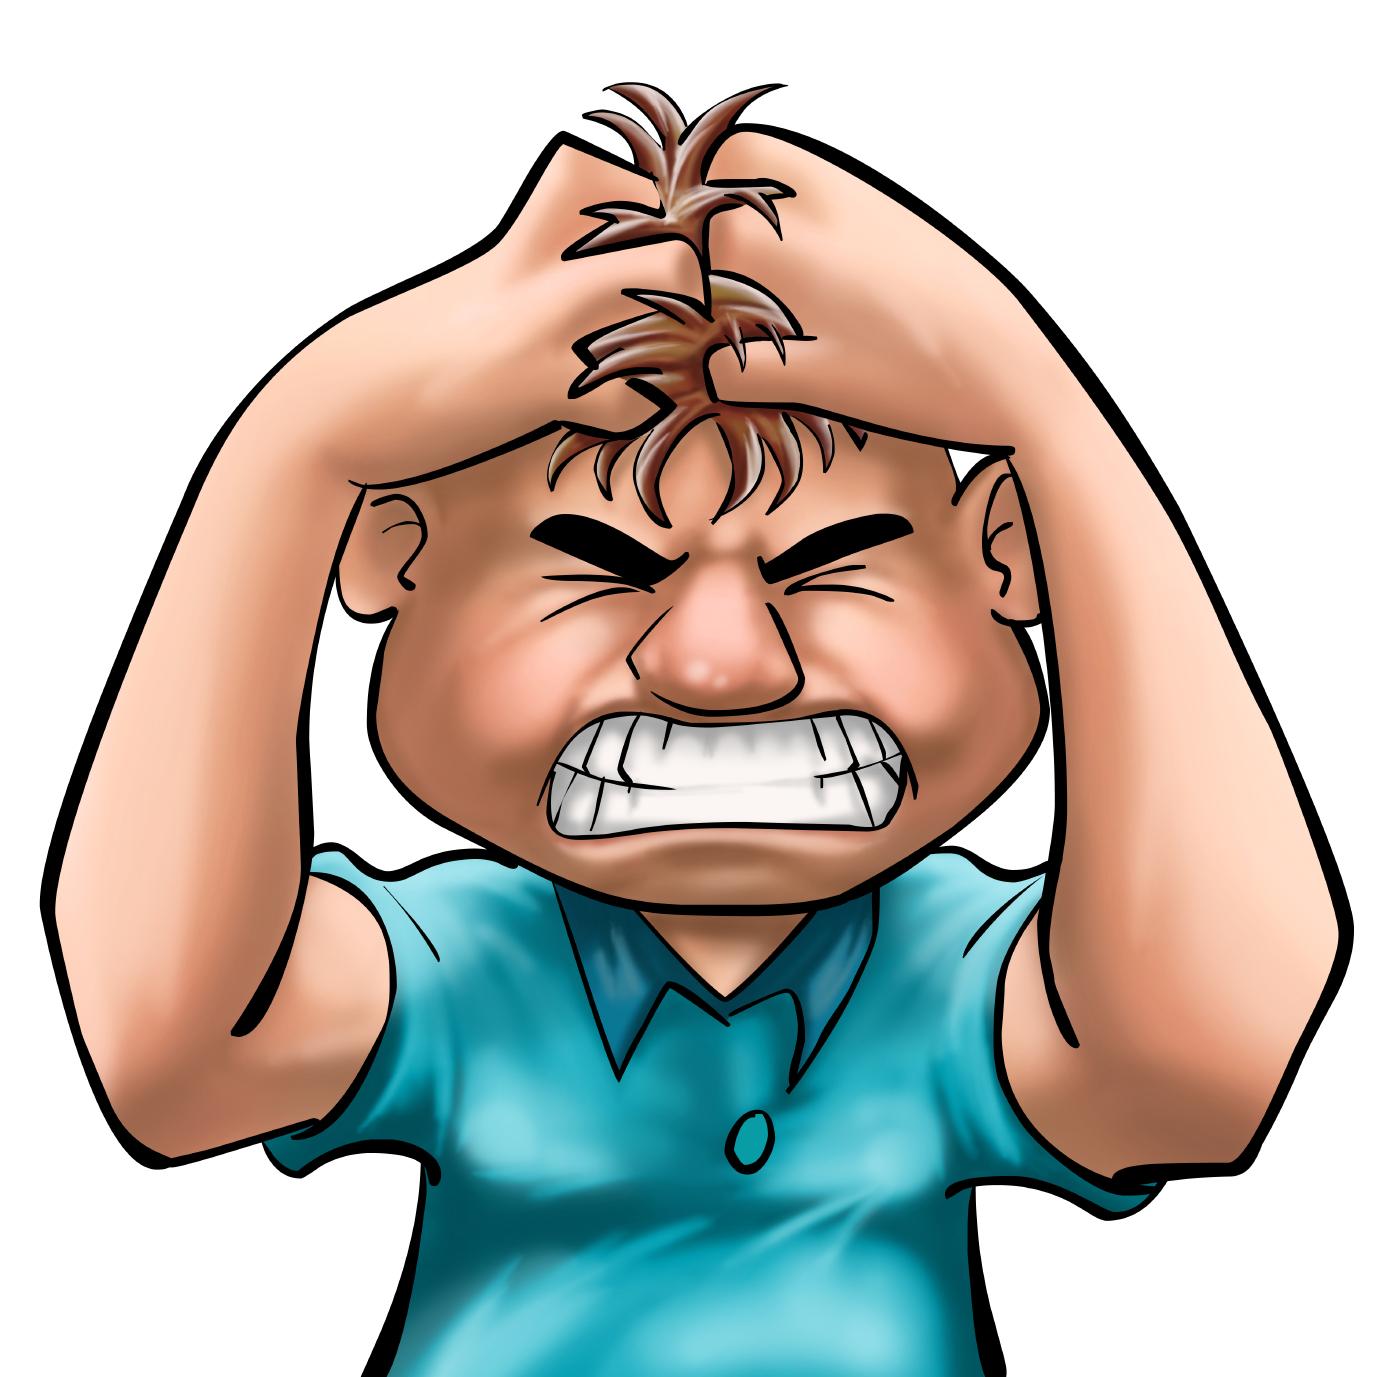 Stress clipart mental stress. Free download clip art